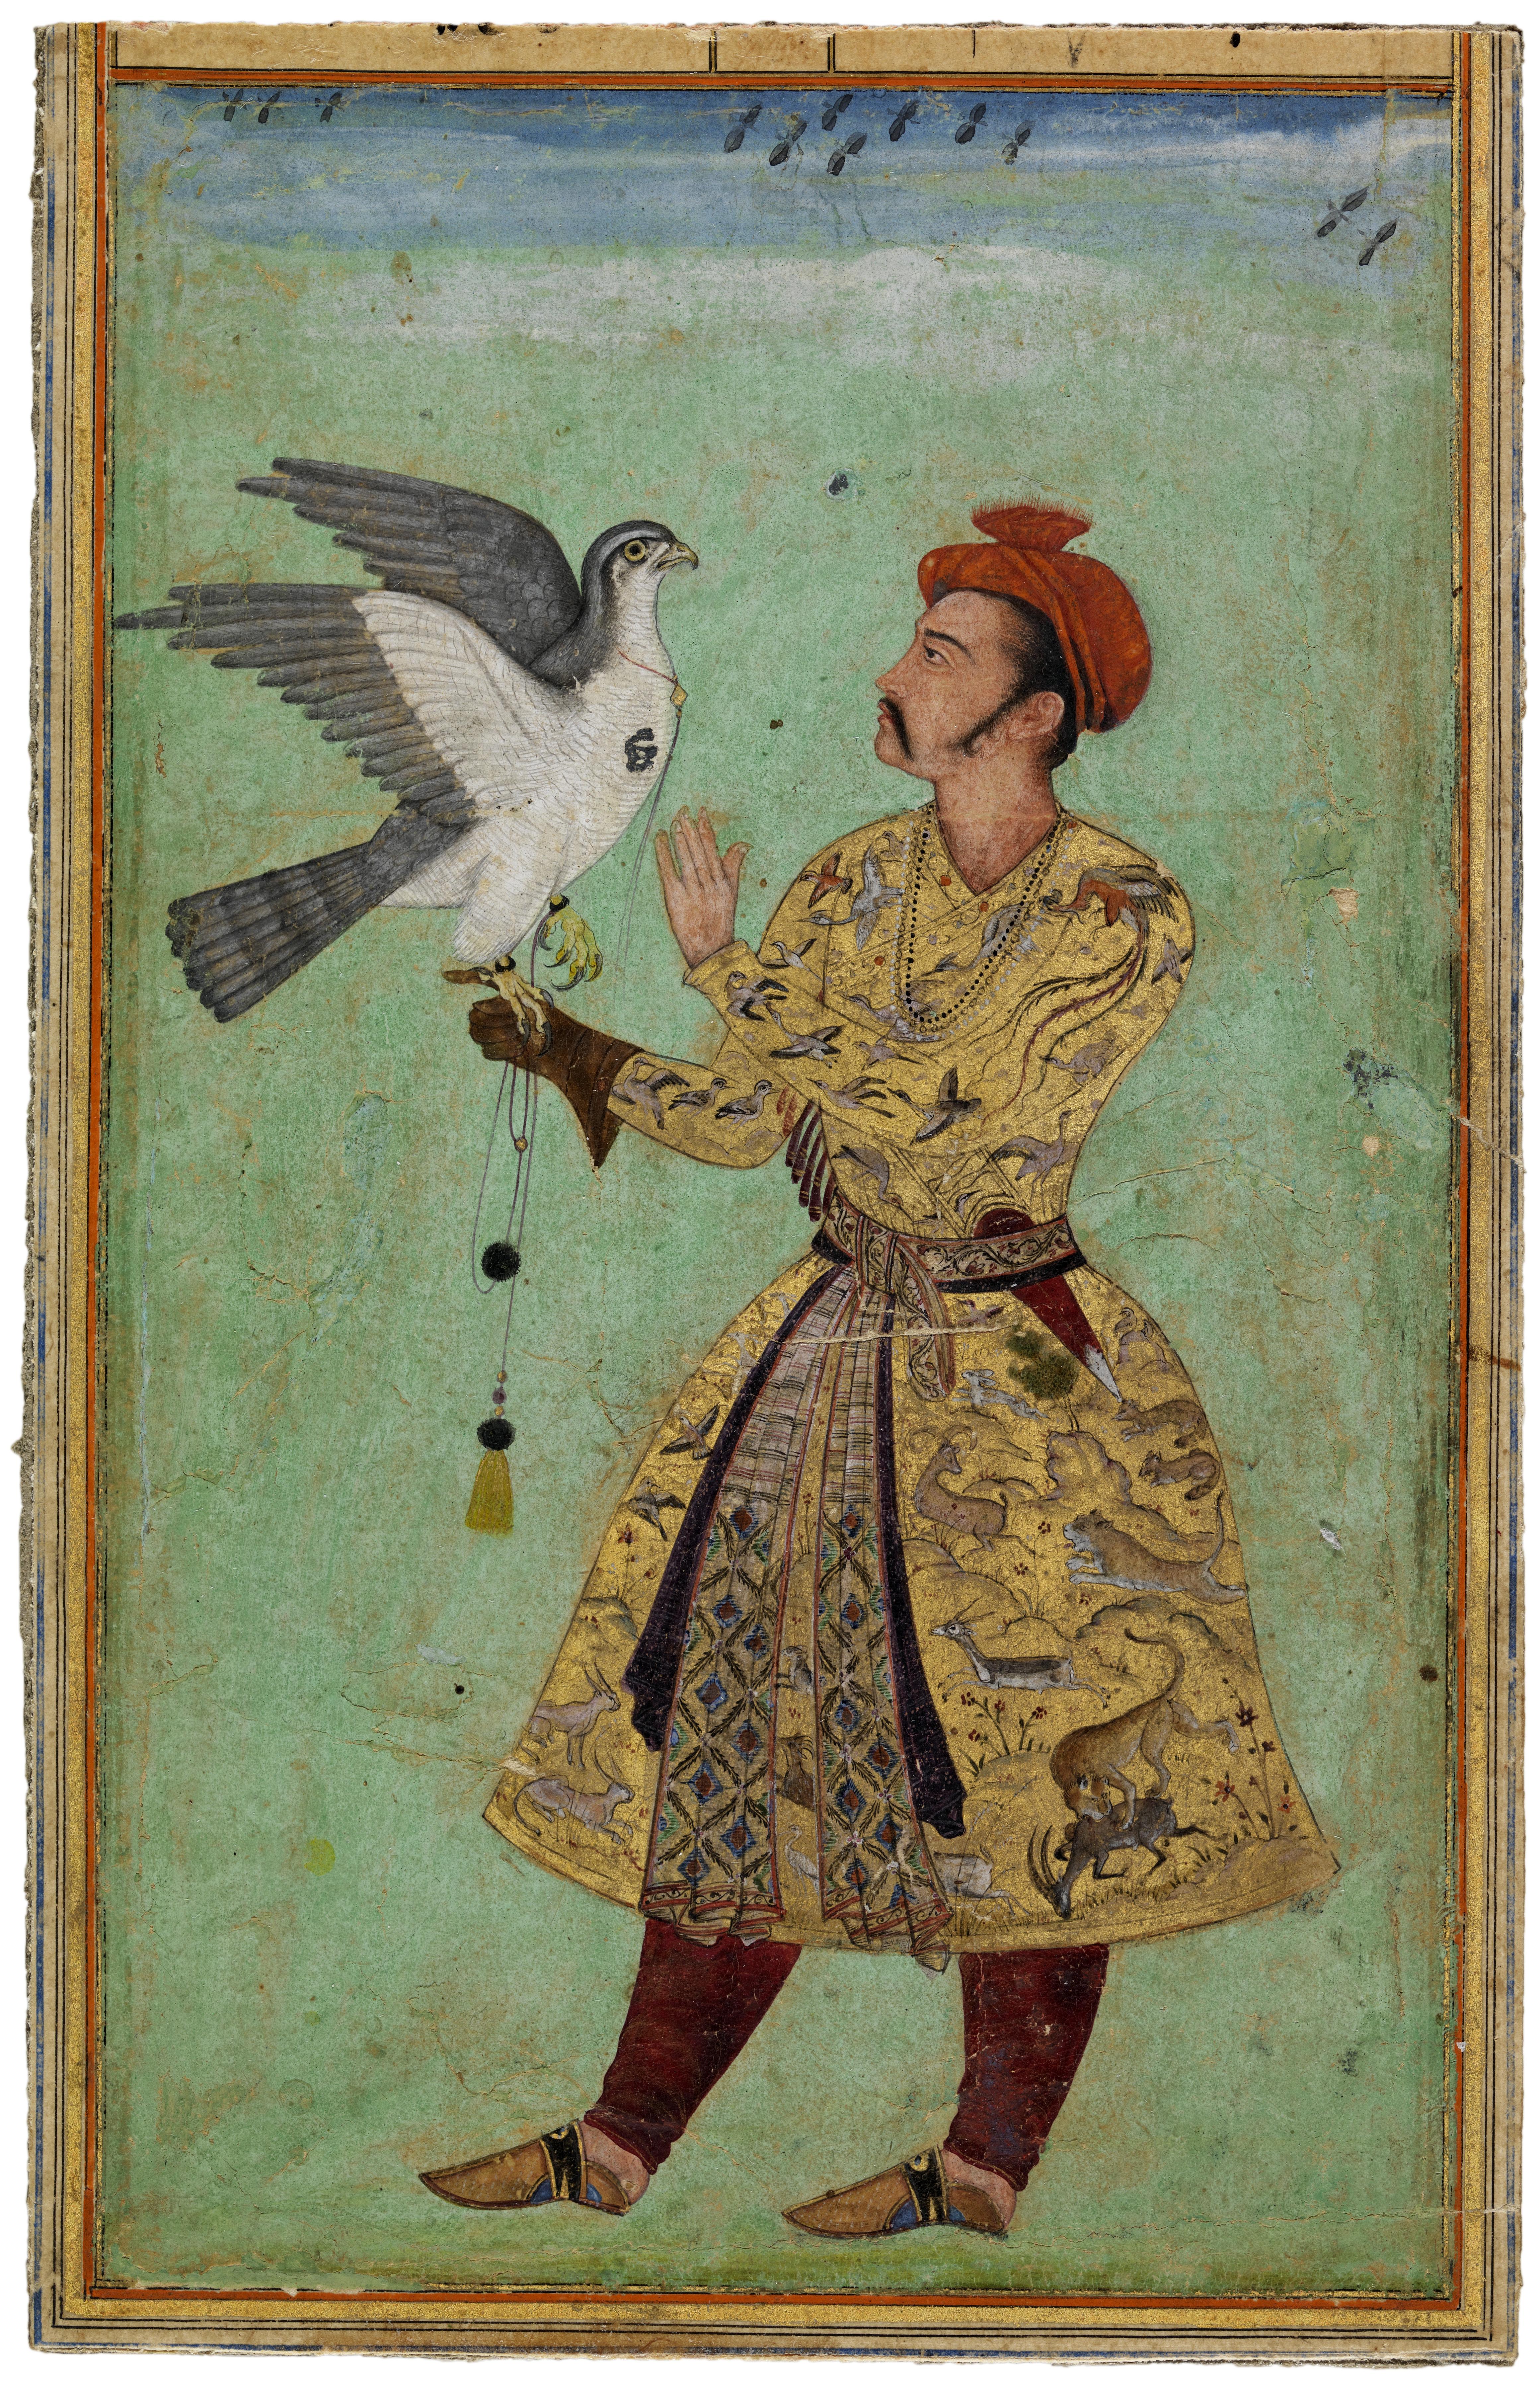 A Prince with a Falcon.jpg